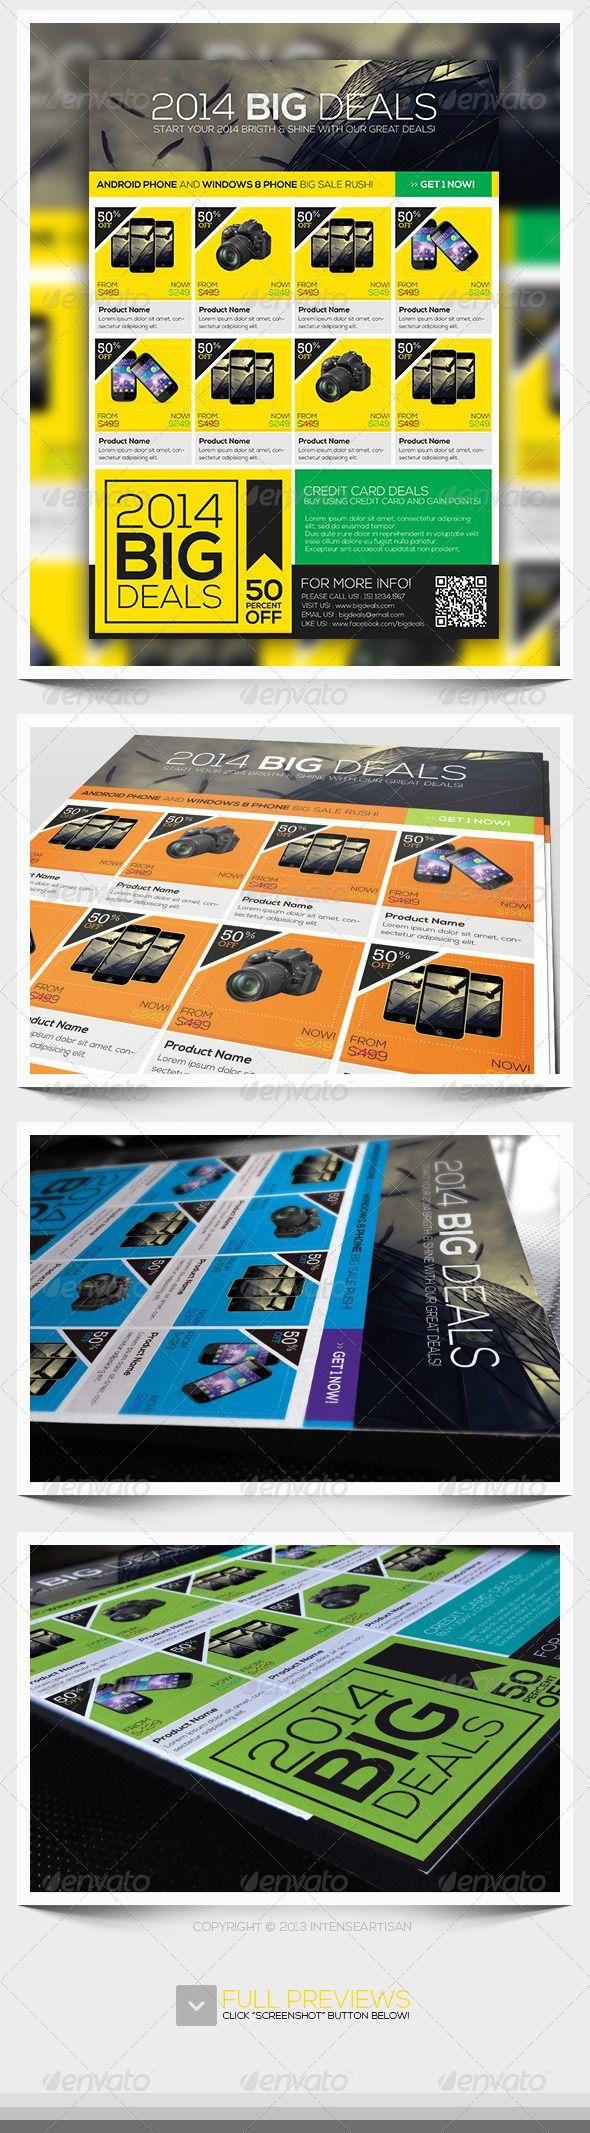 Big Sale Promotion Flyer Template PSD. Download here: http://graphicriver.net/item/2014-big-sale-promotion-flyer-v1/6431581?ref=yinkira